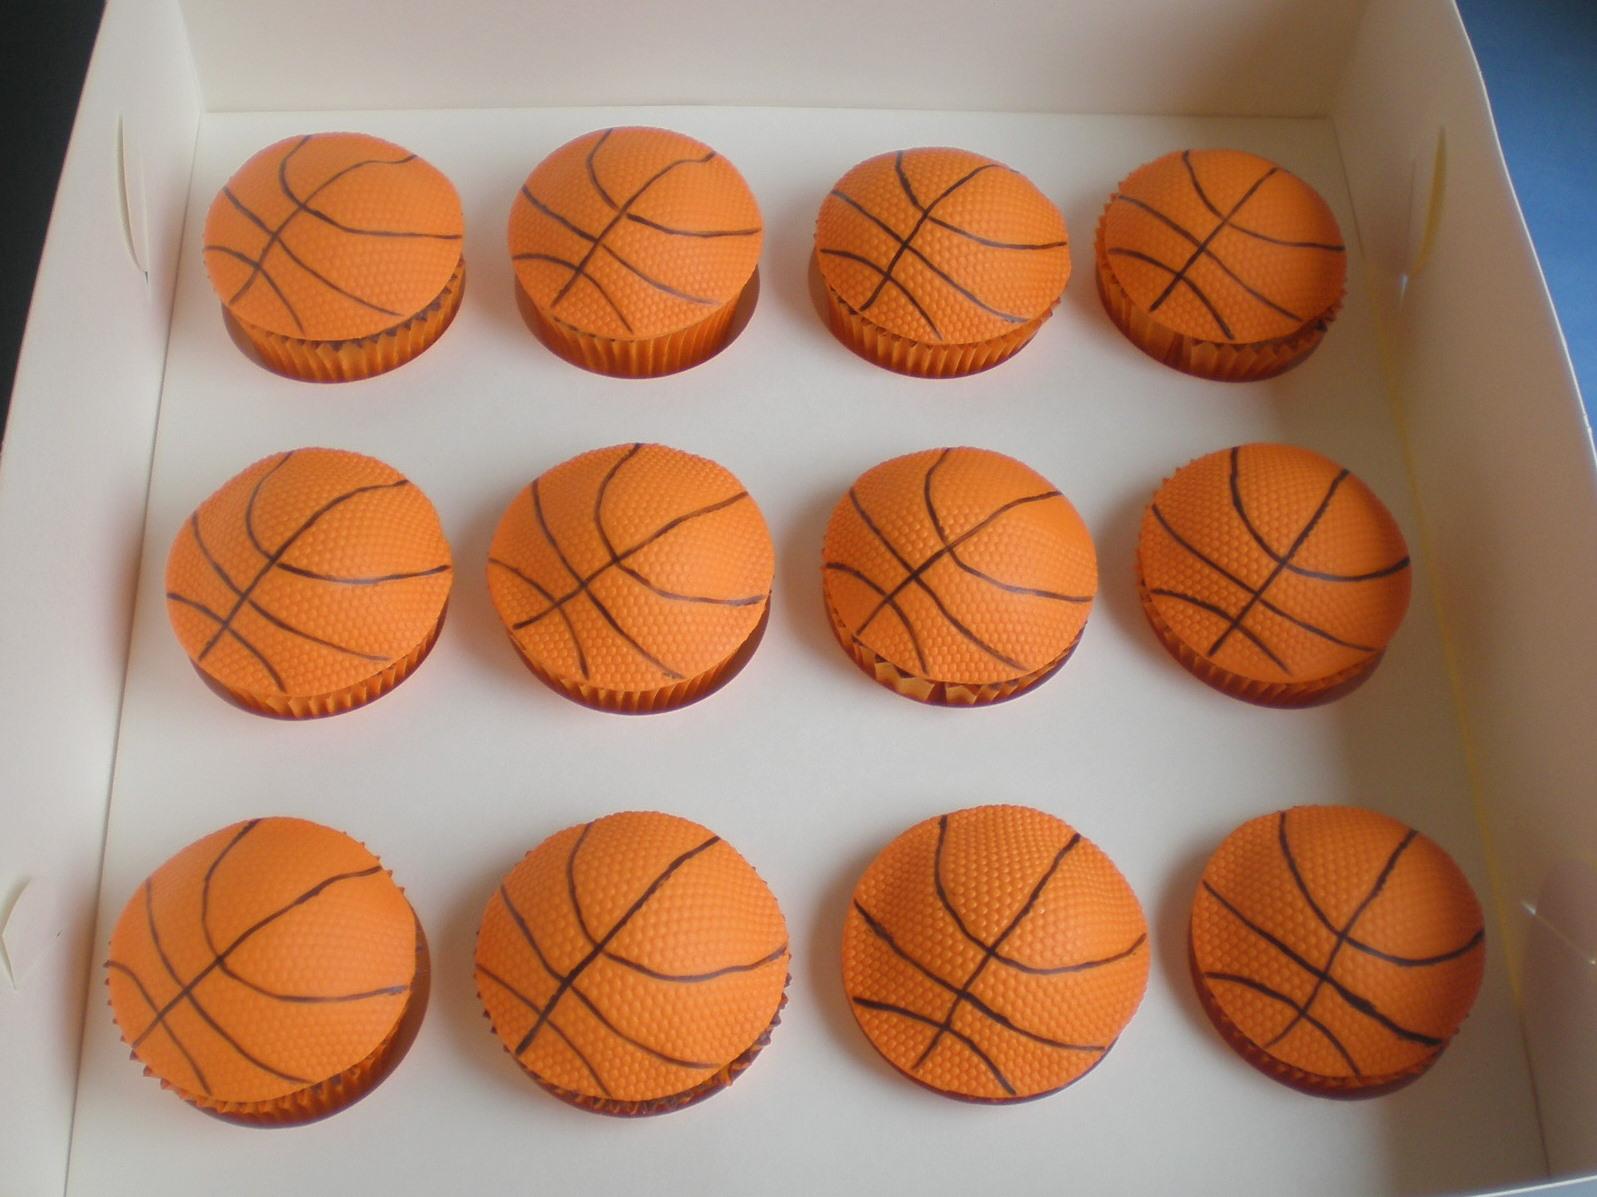 Top Basketball Cupcake Cake Idea 1597 x 1197 · 347 kB · jpeg